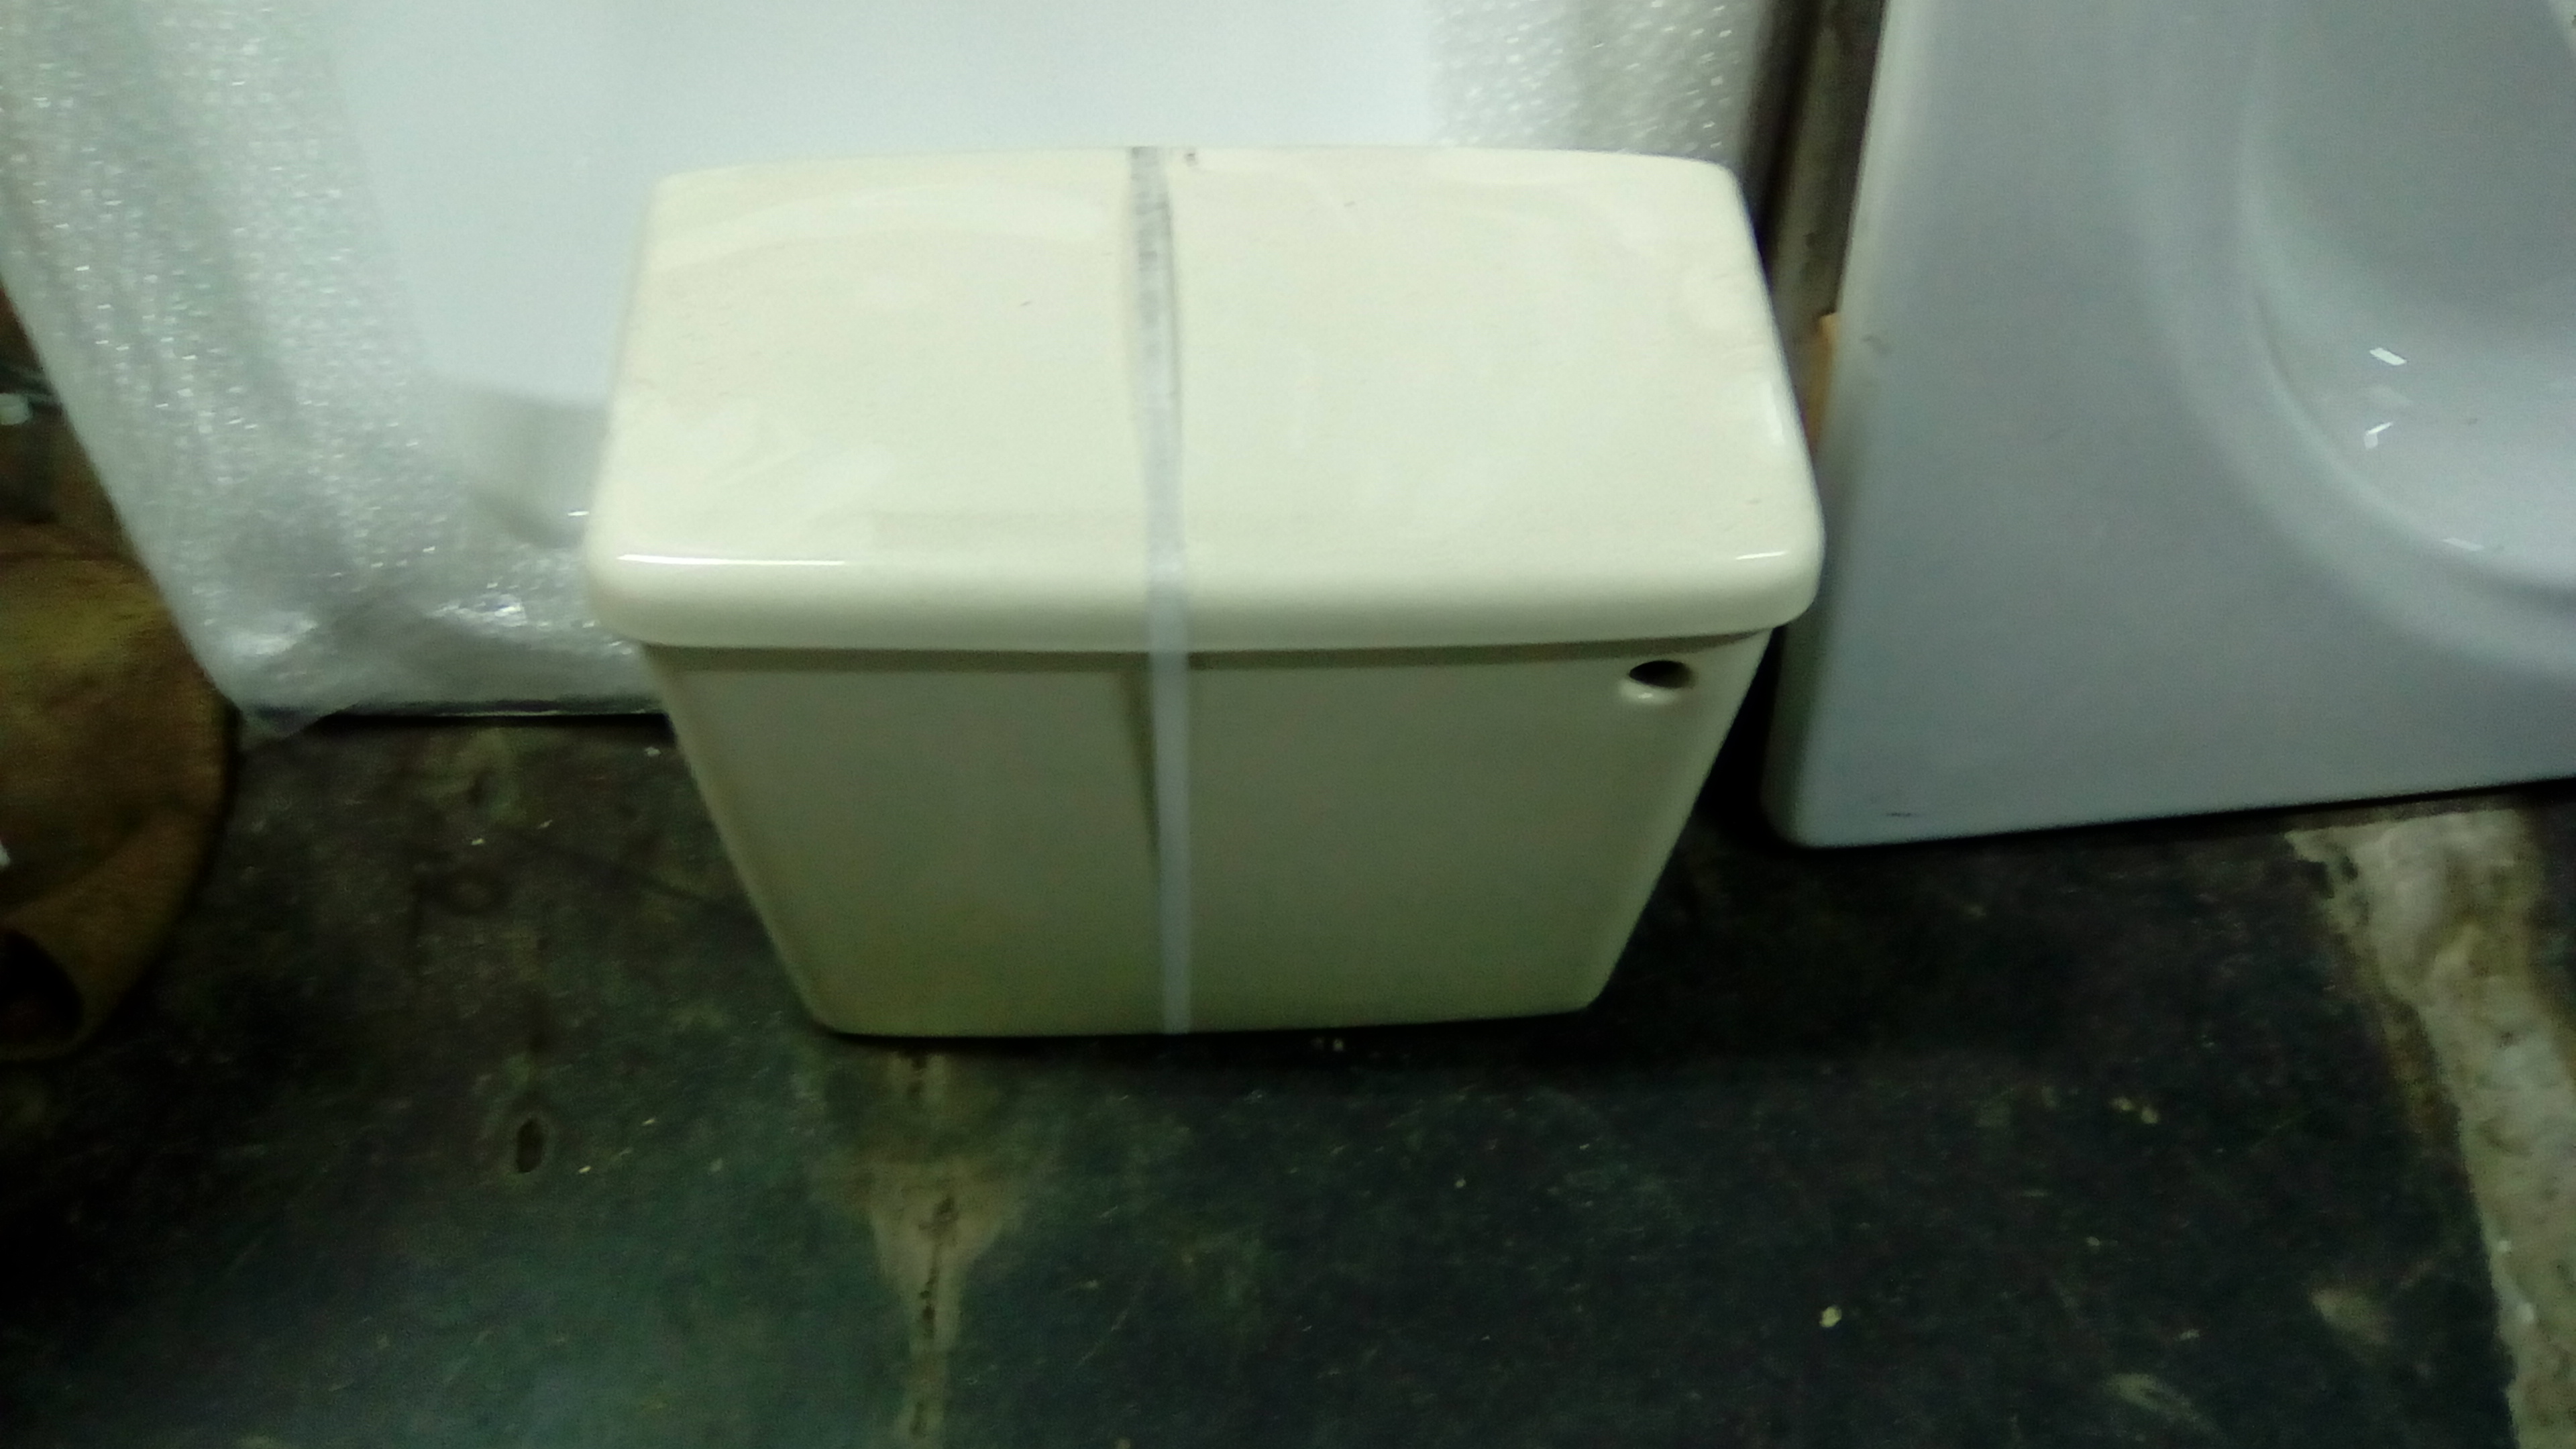 Indian Ivory Colour Bathroom Parts. Cisterns Basins Baths Seats